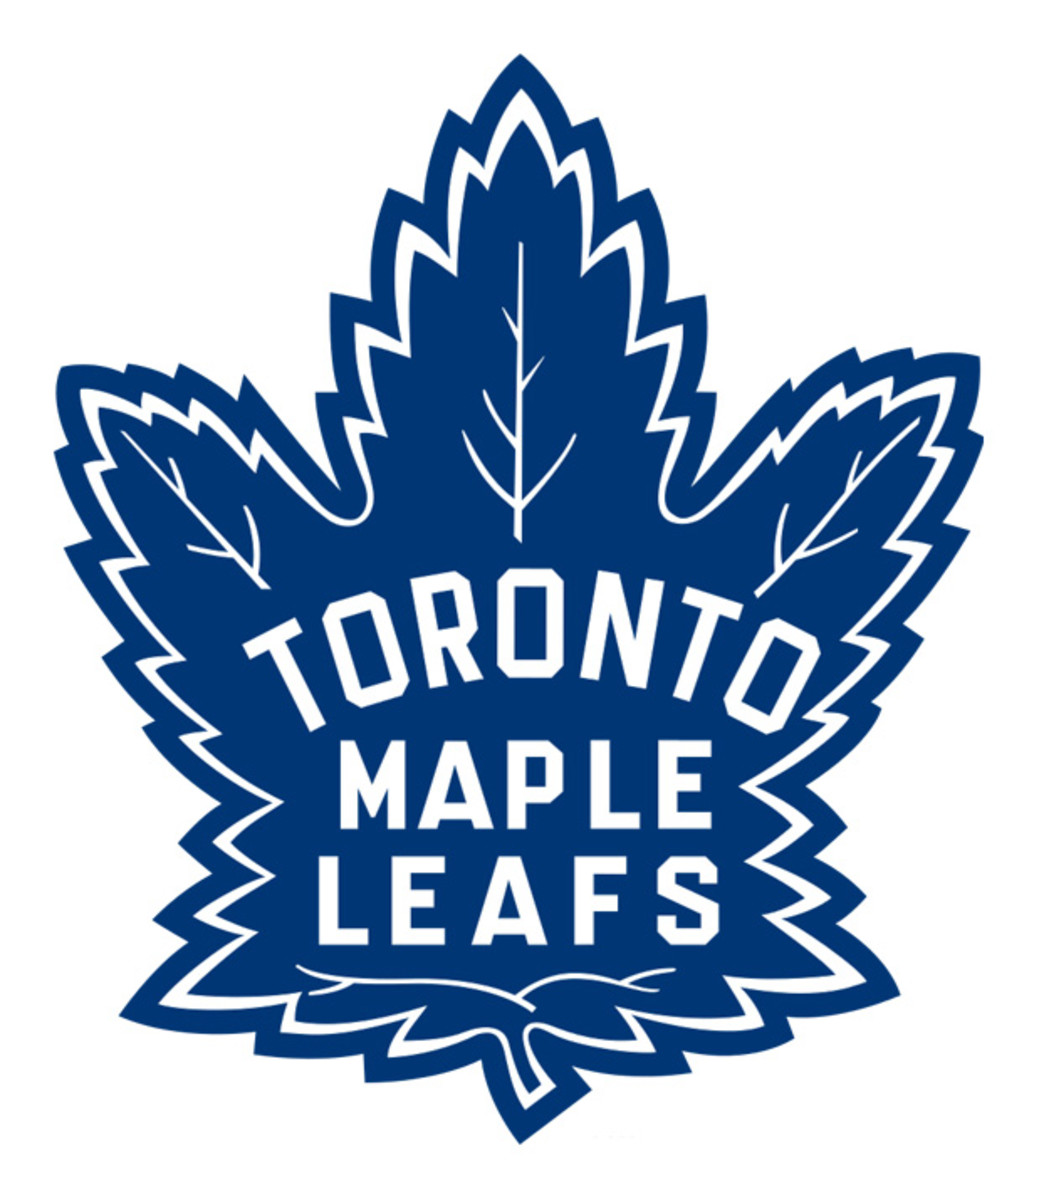 Toronto-Maple-Leafs-logo-1963-67.jpg